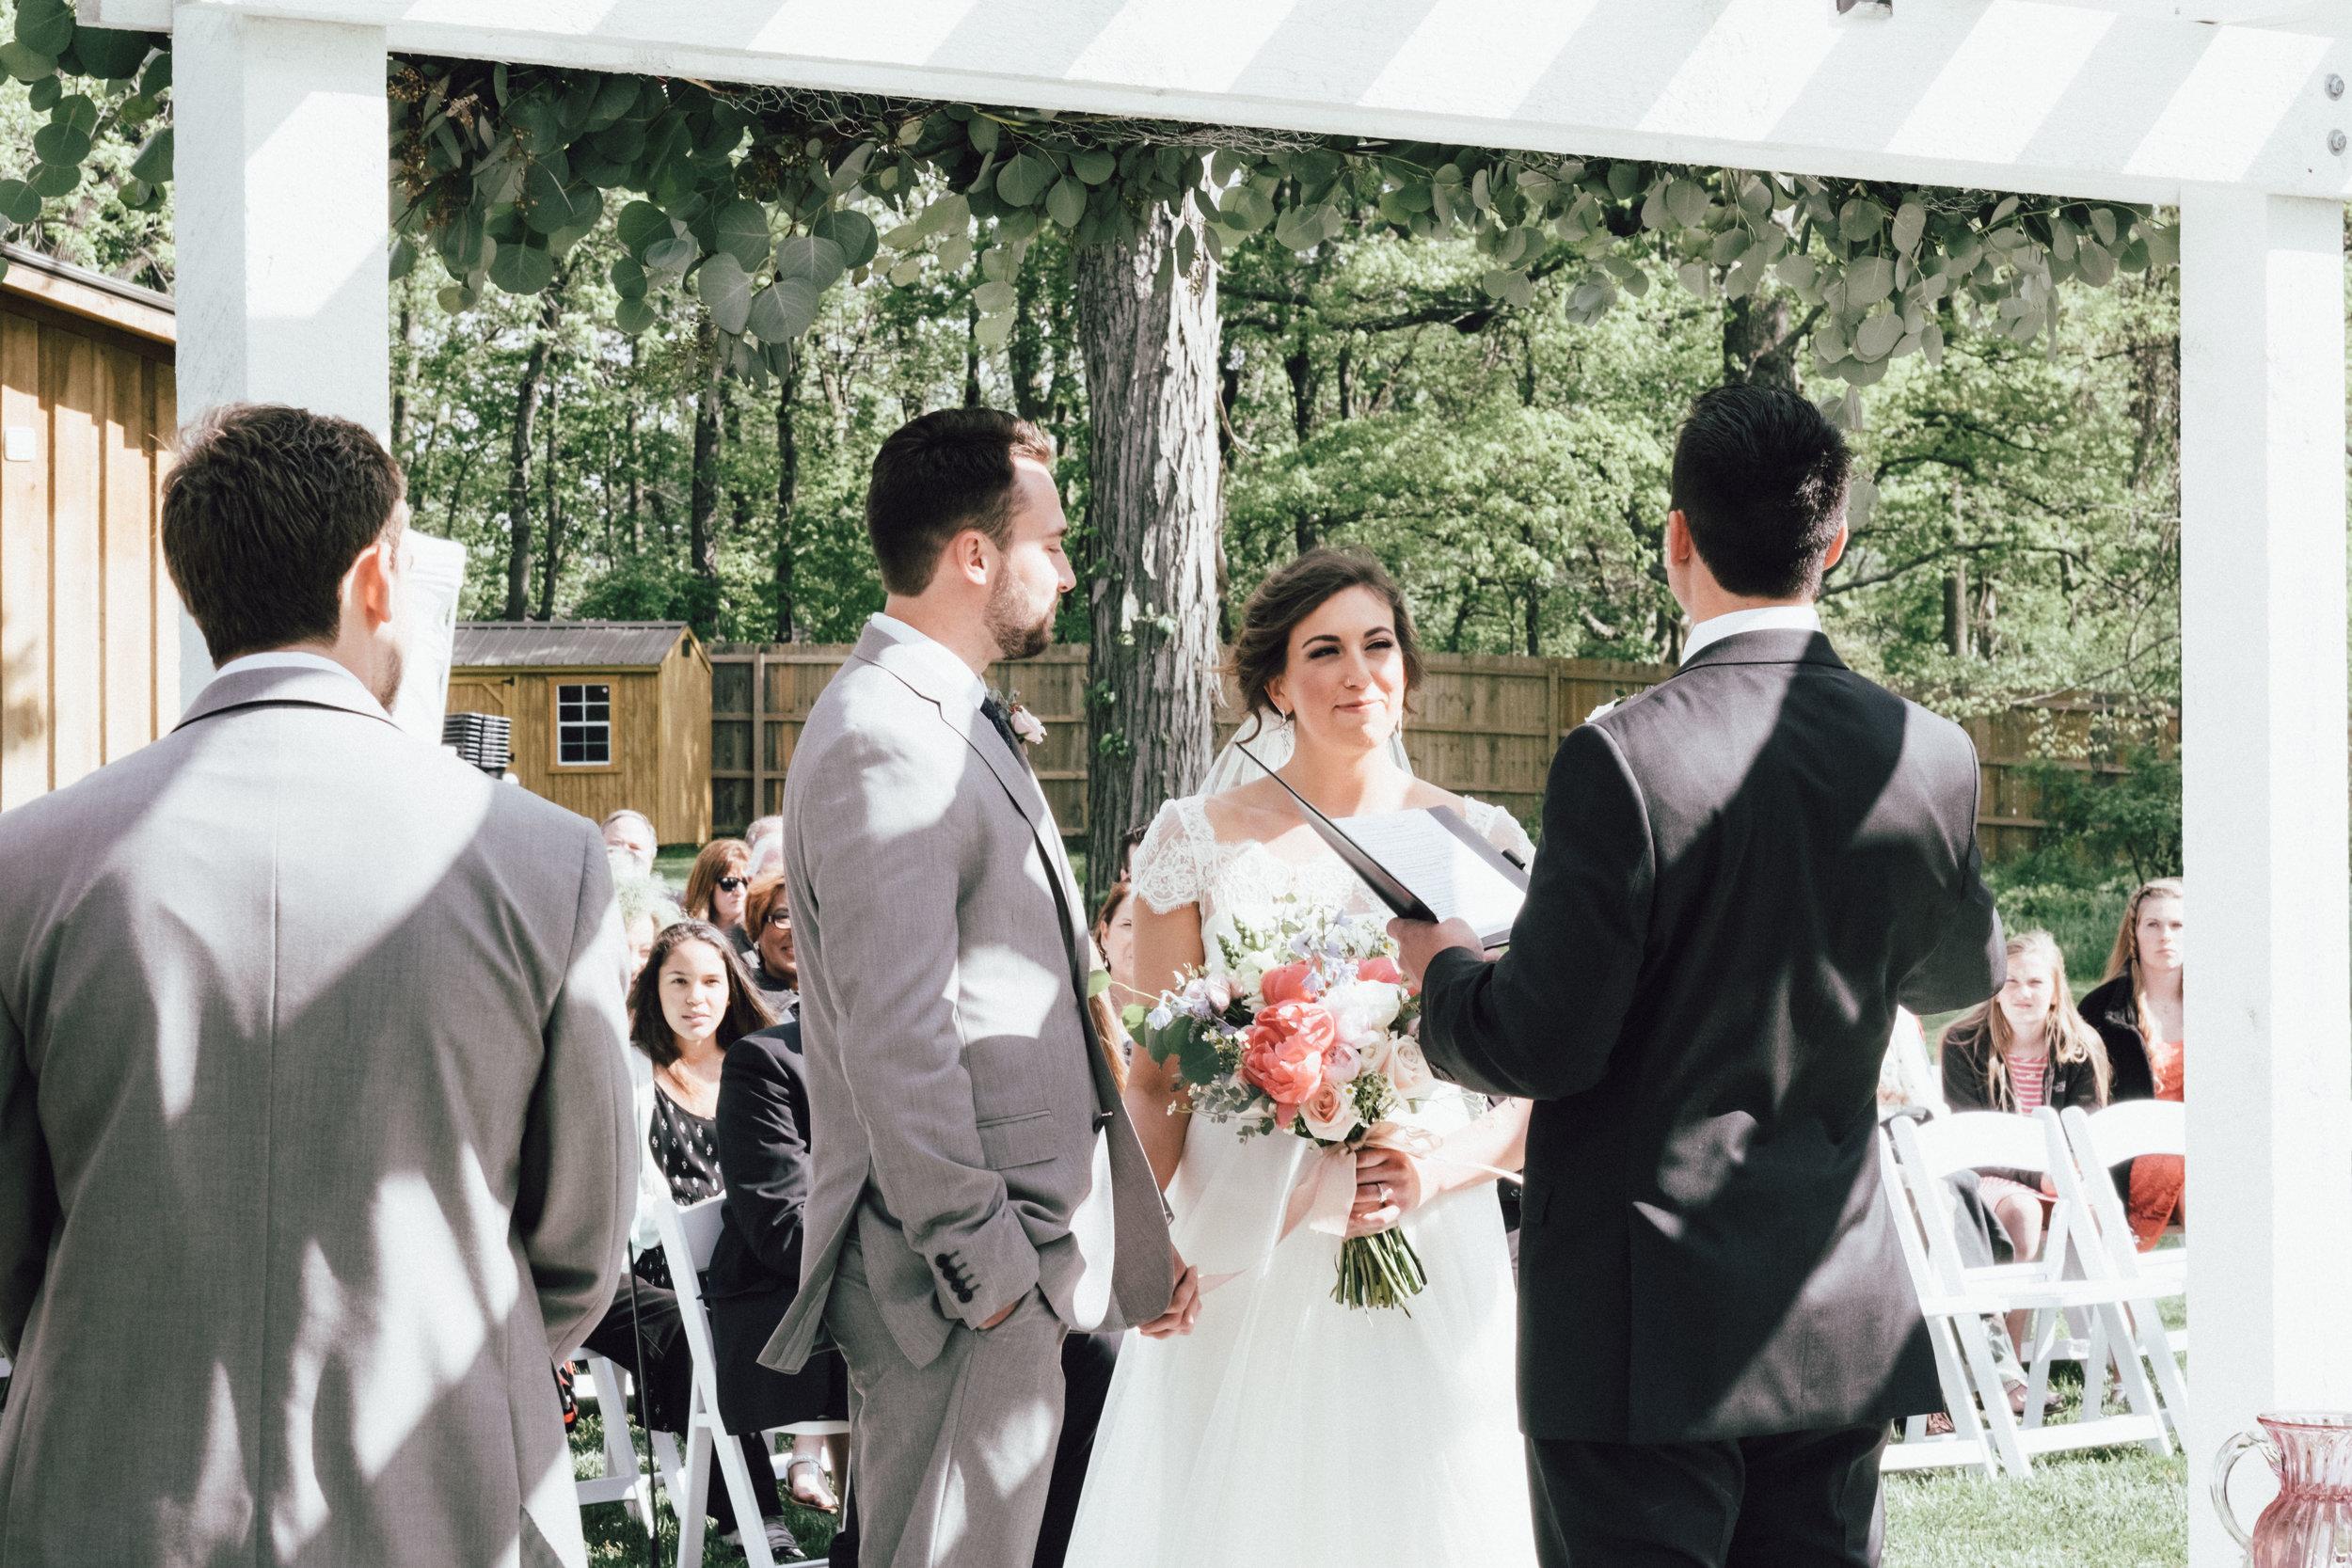 Steph-Ben-Blog-Indianapolis-Wedding-37.jpg